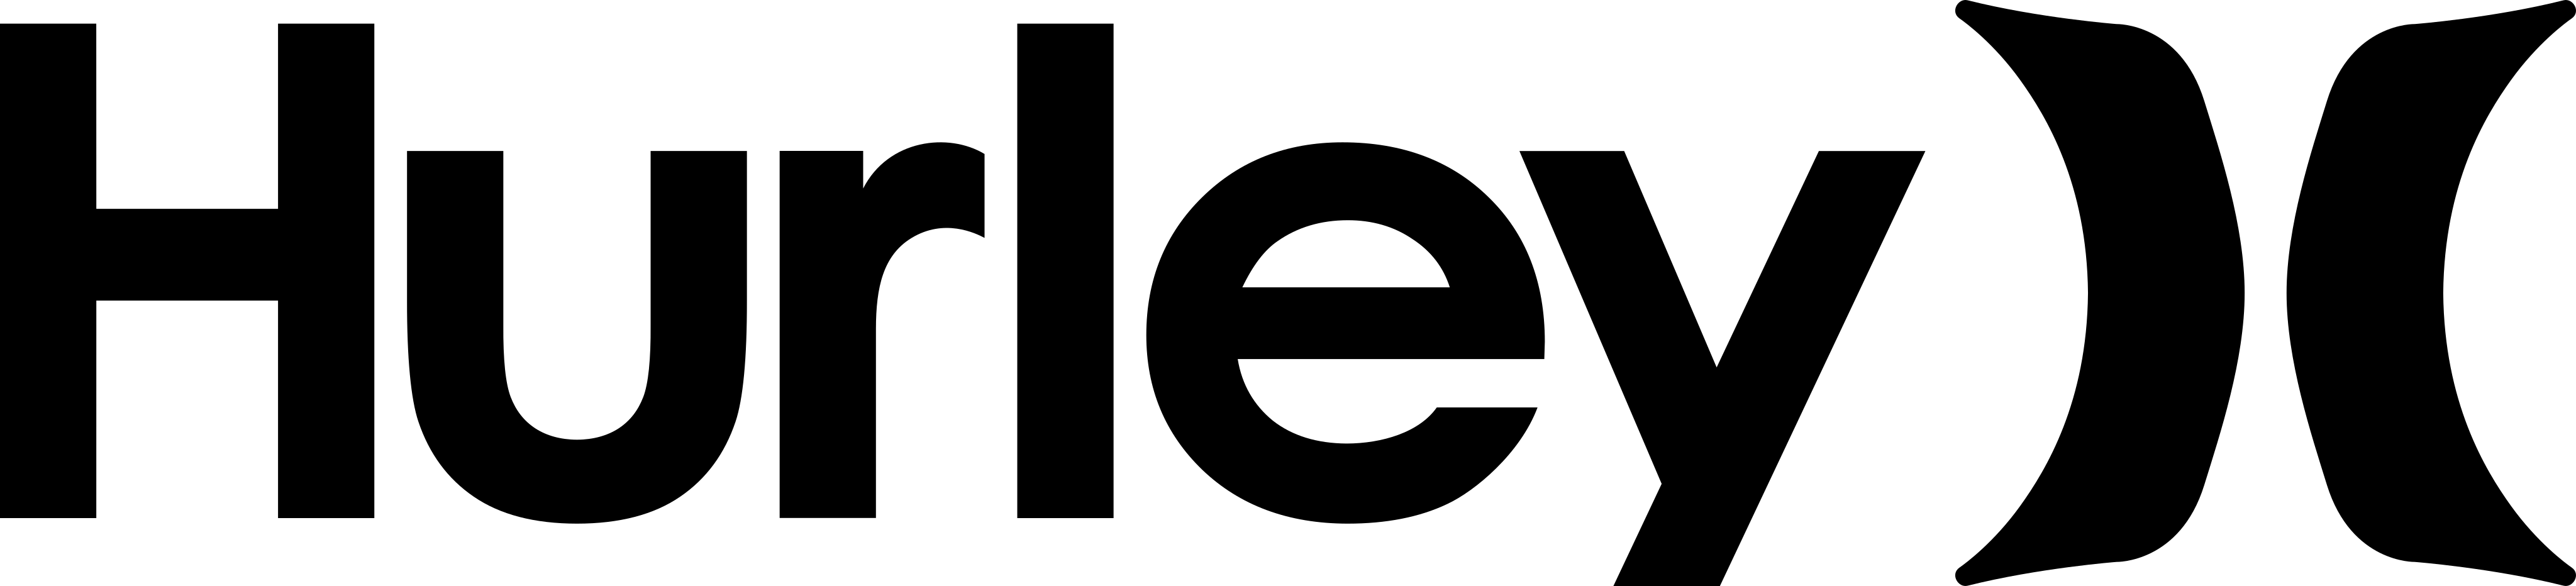 hurley logo - Hurley Logo